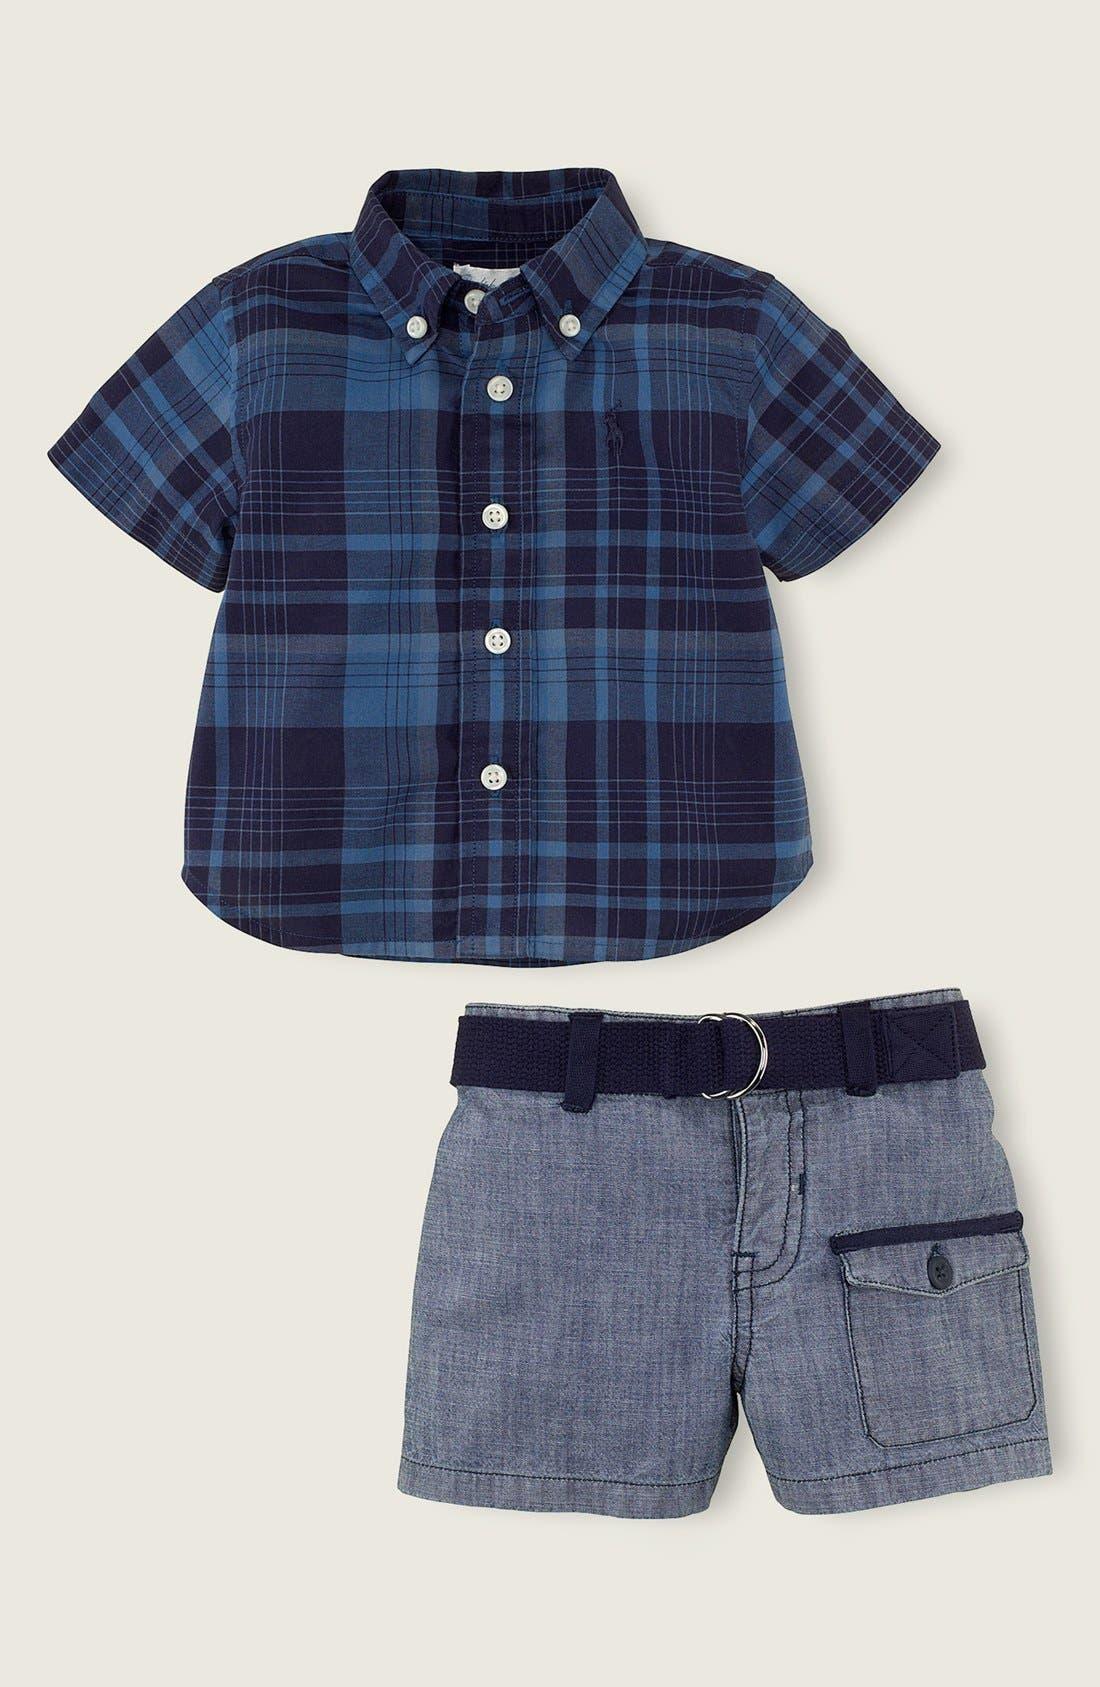 Main Image - Ralph Lauren Plaid Shirt & Shorts (Baby Boys)